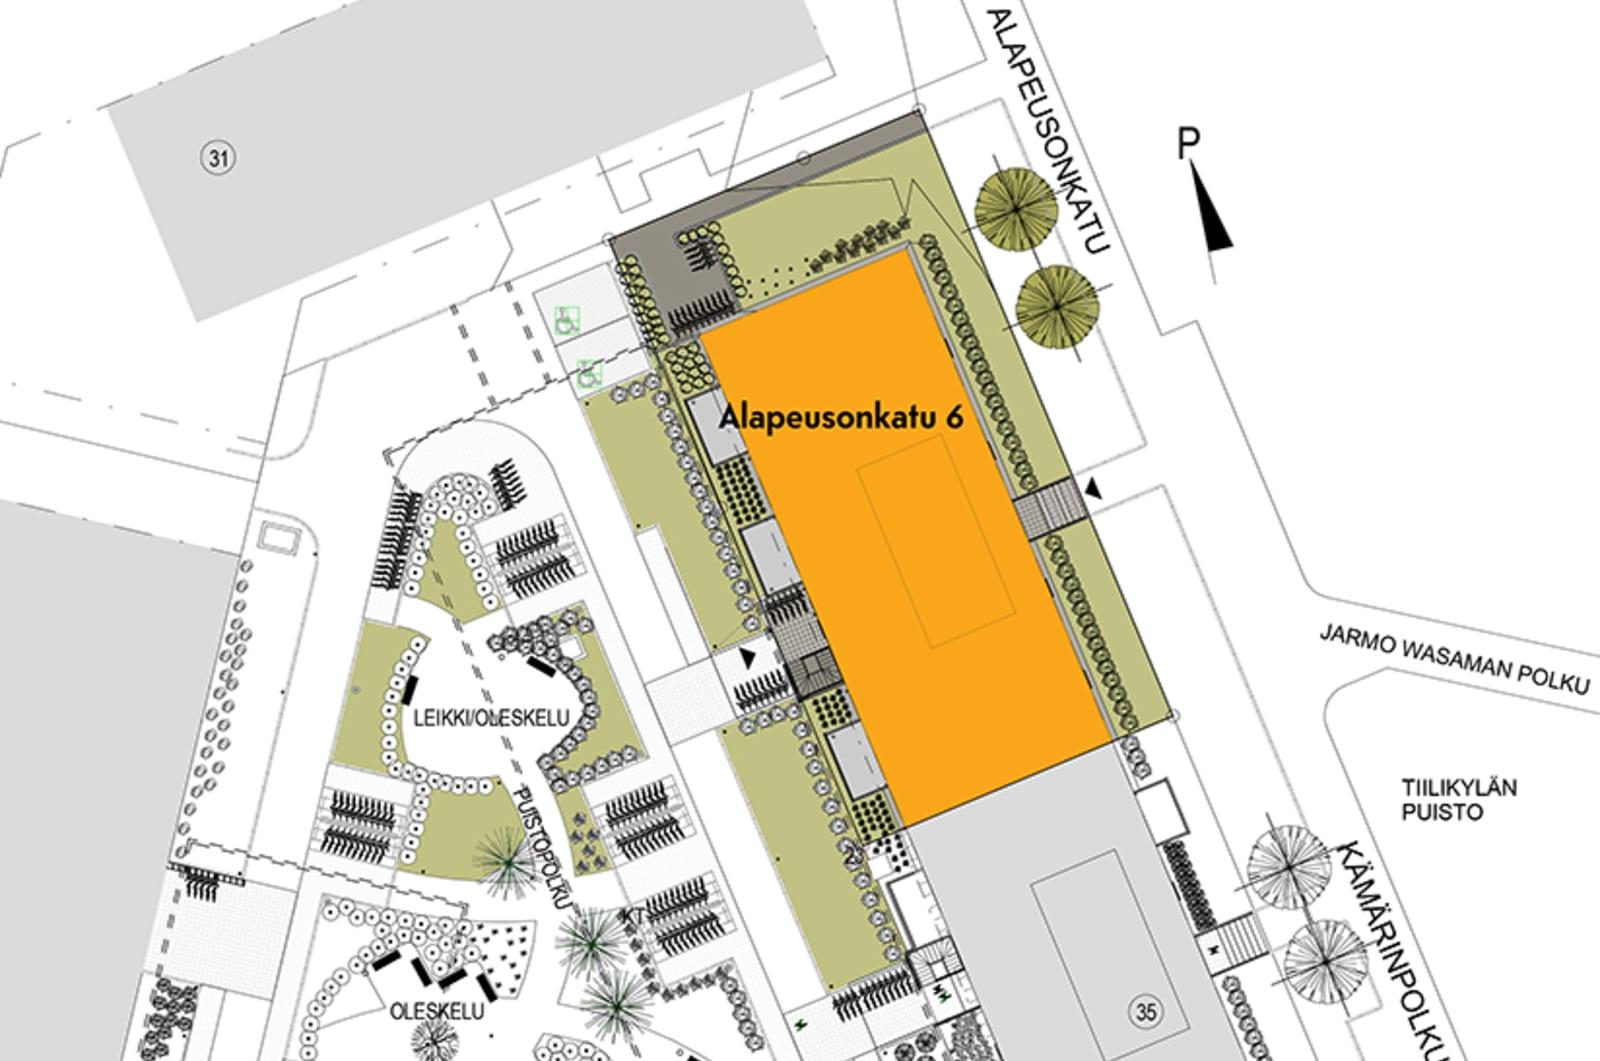 Tampere, Kaleva, Alapeusonkatu 6